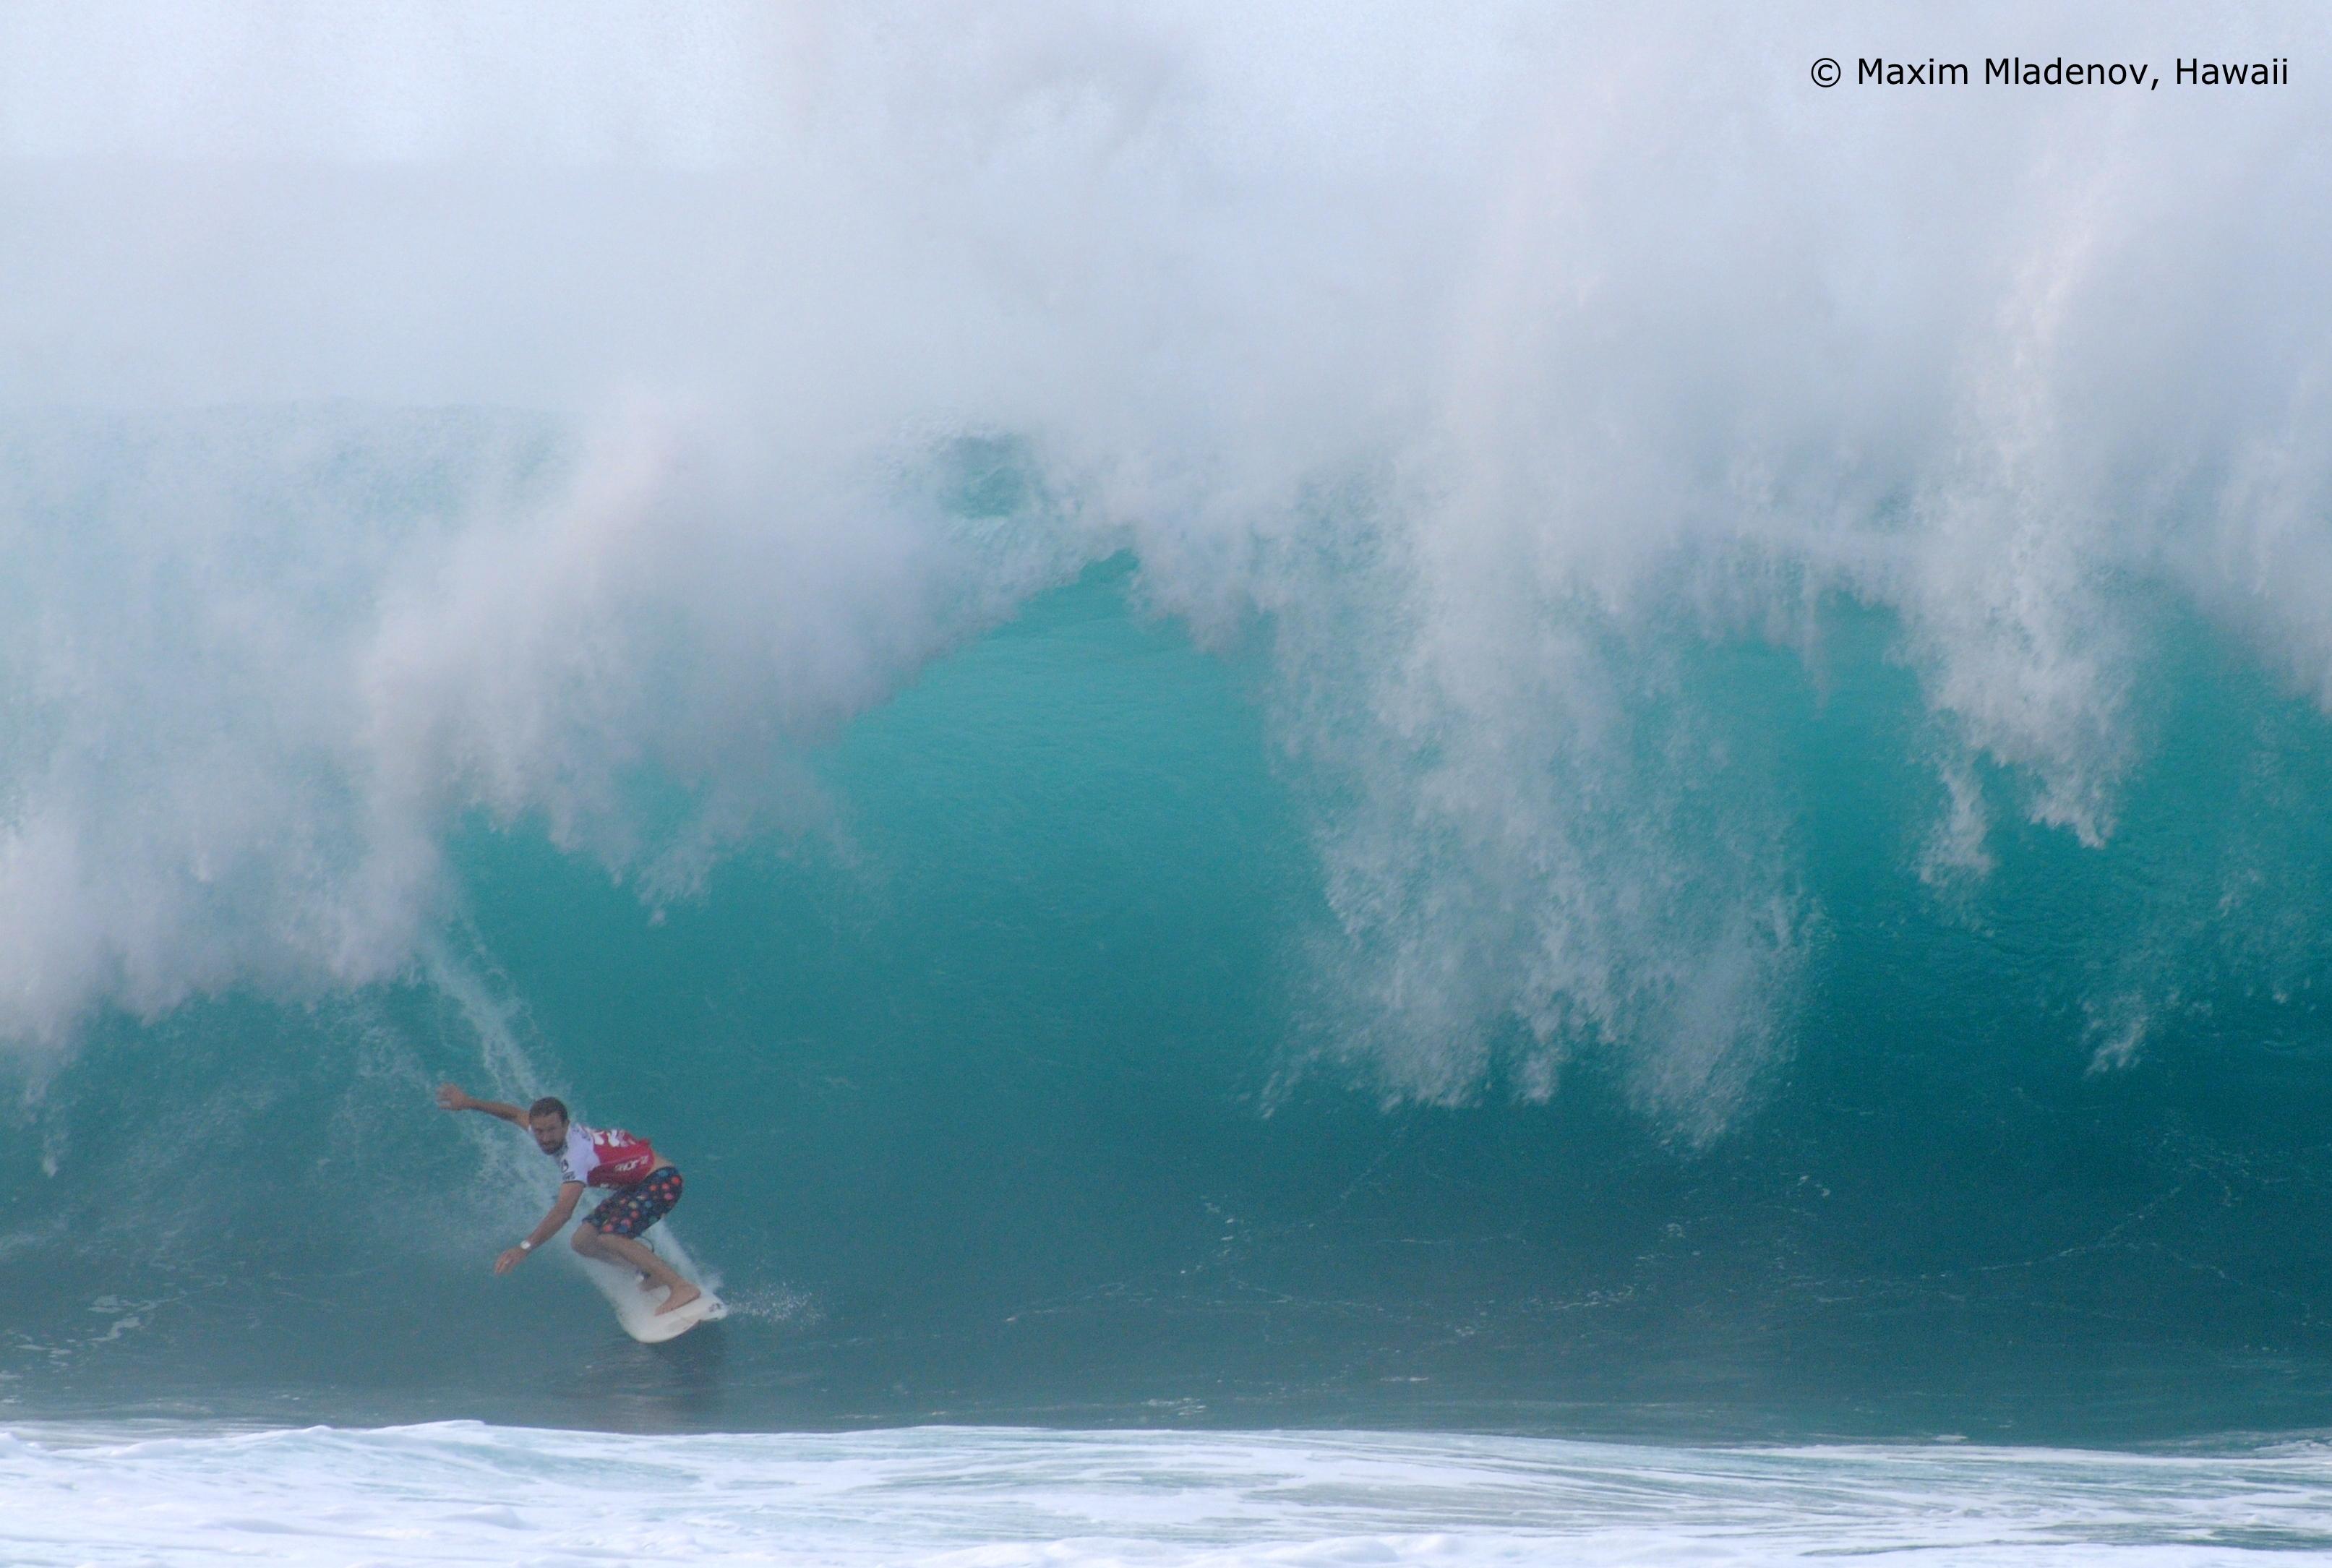 Escape - 1er Tour 08-12-2011 Billabong PIPE Masters © Maxim Mladenov, Hawaii